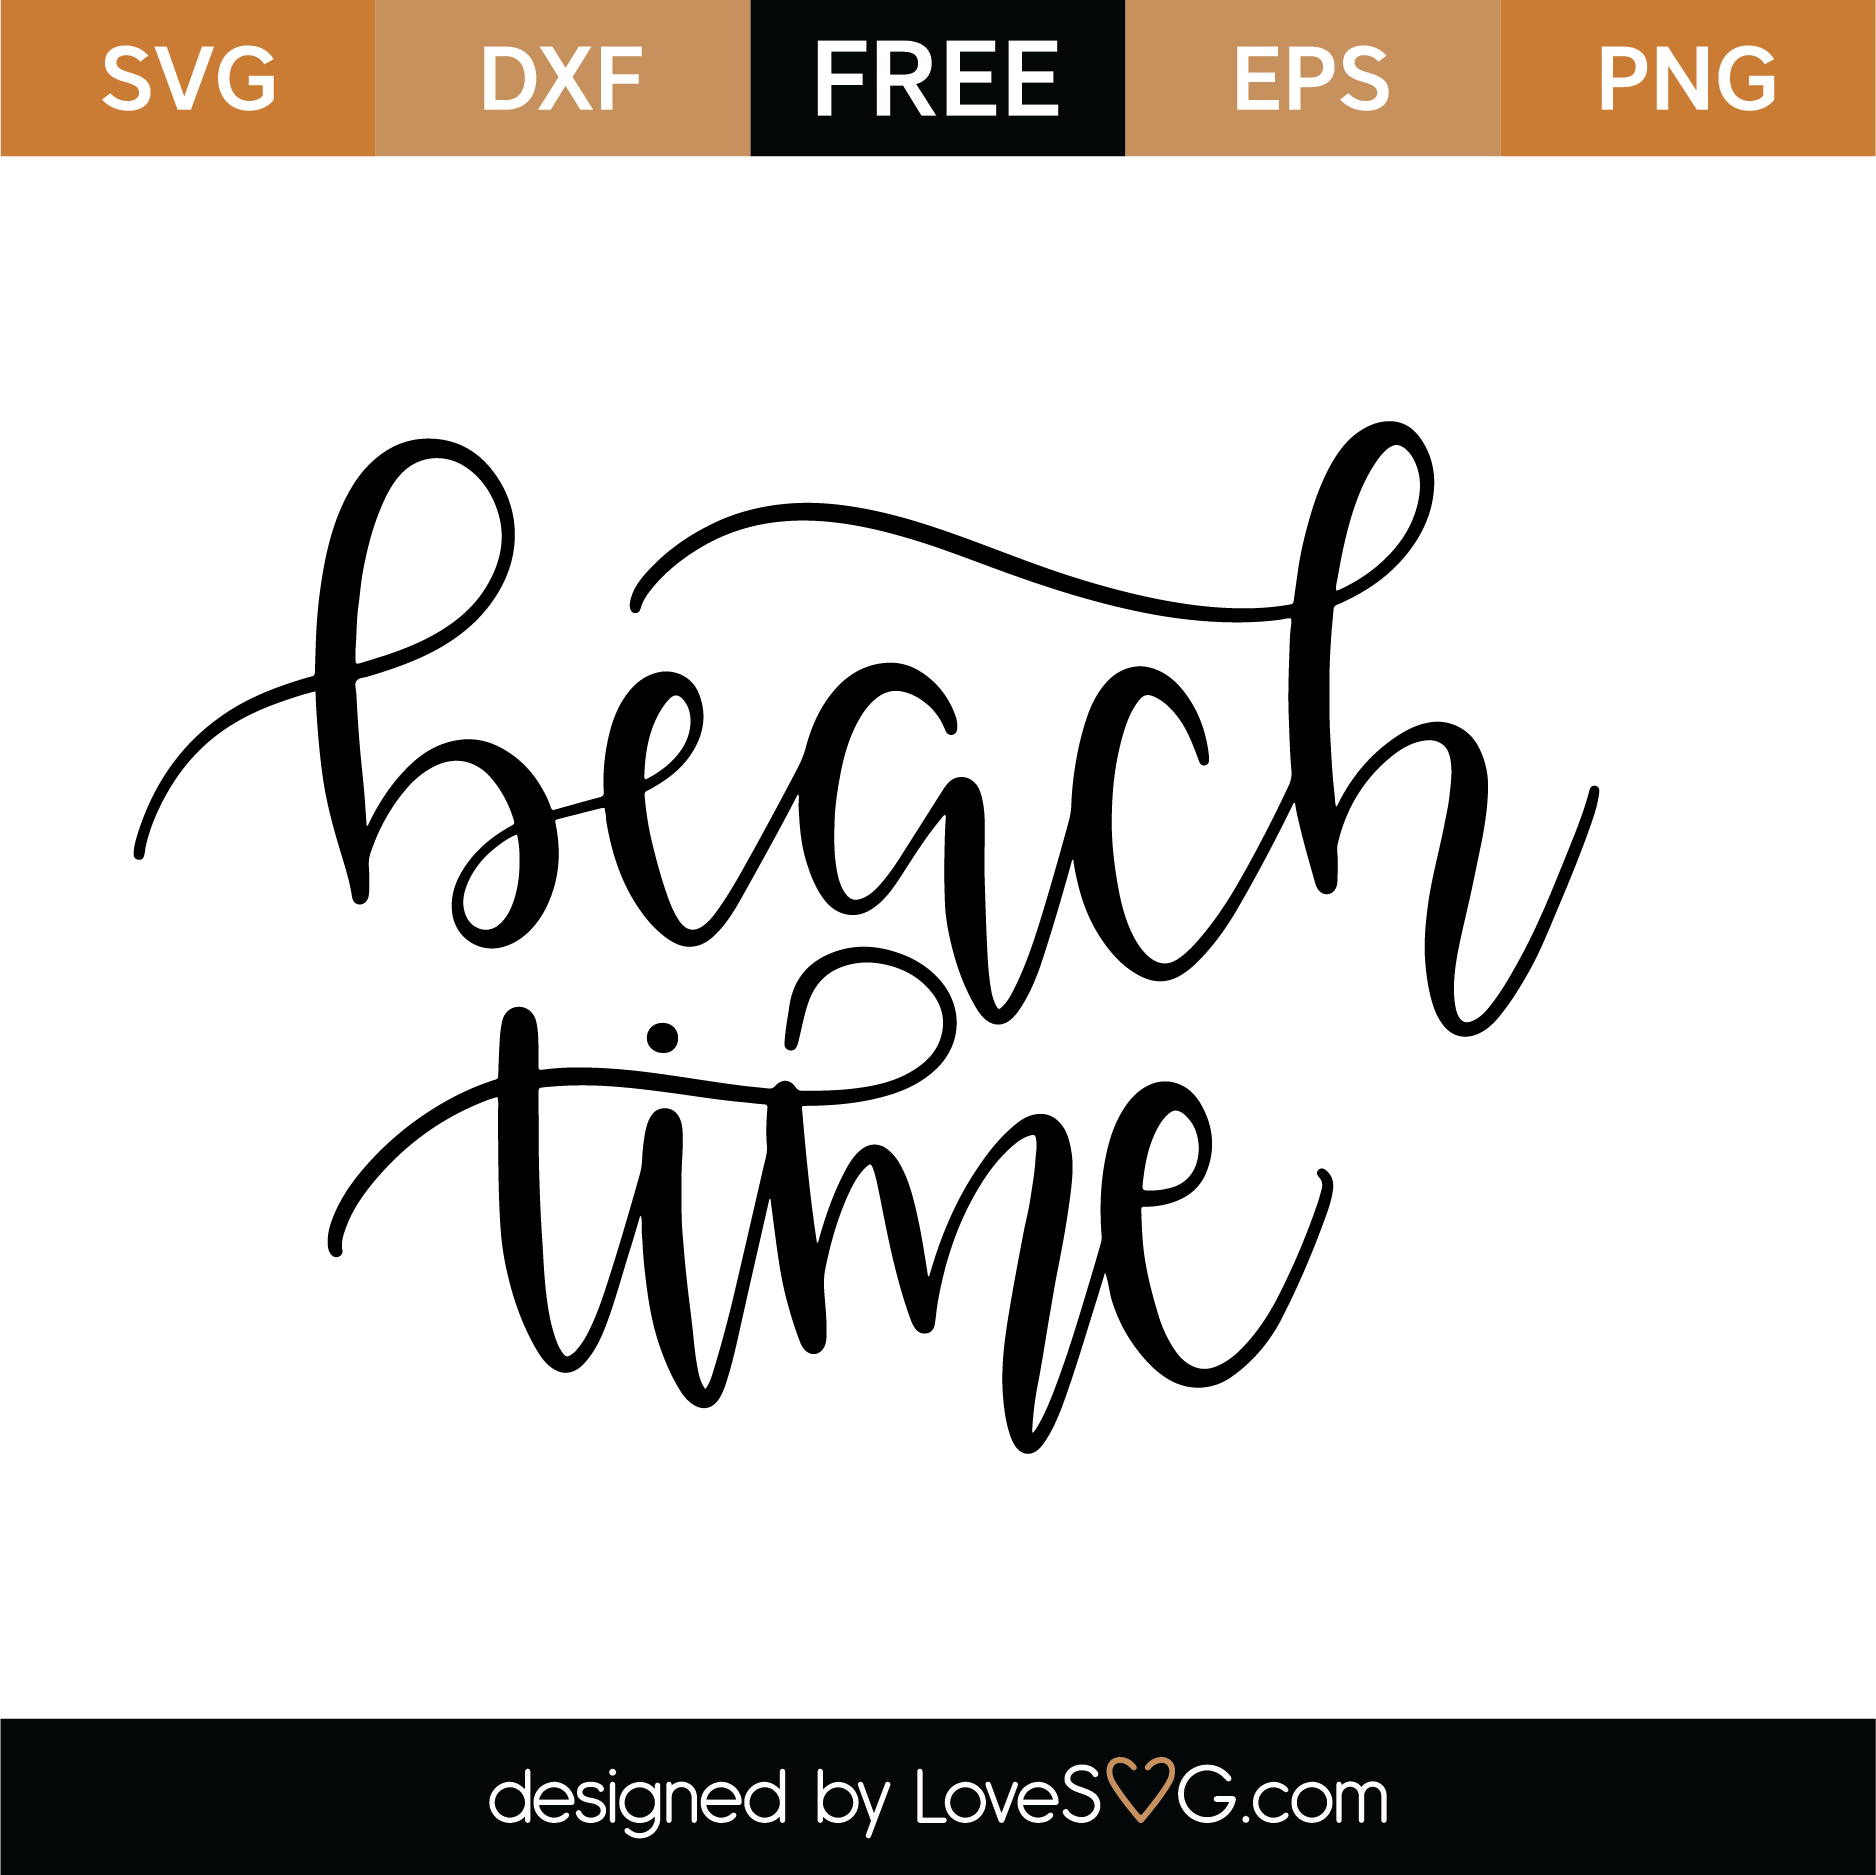 Download Free Beach Time SVG Cut File | Lovesvg.com